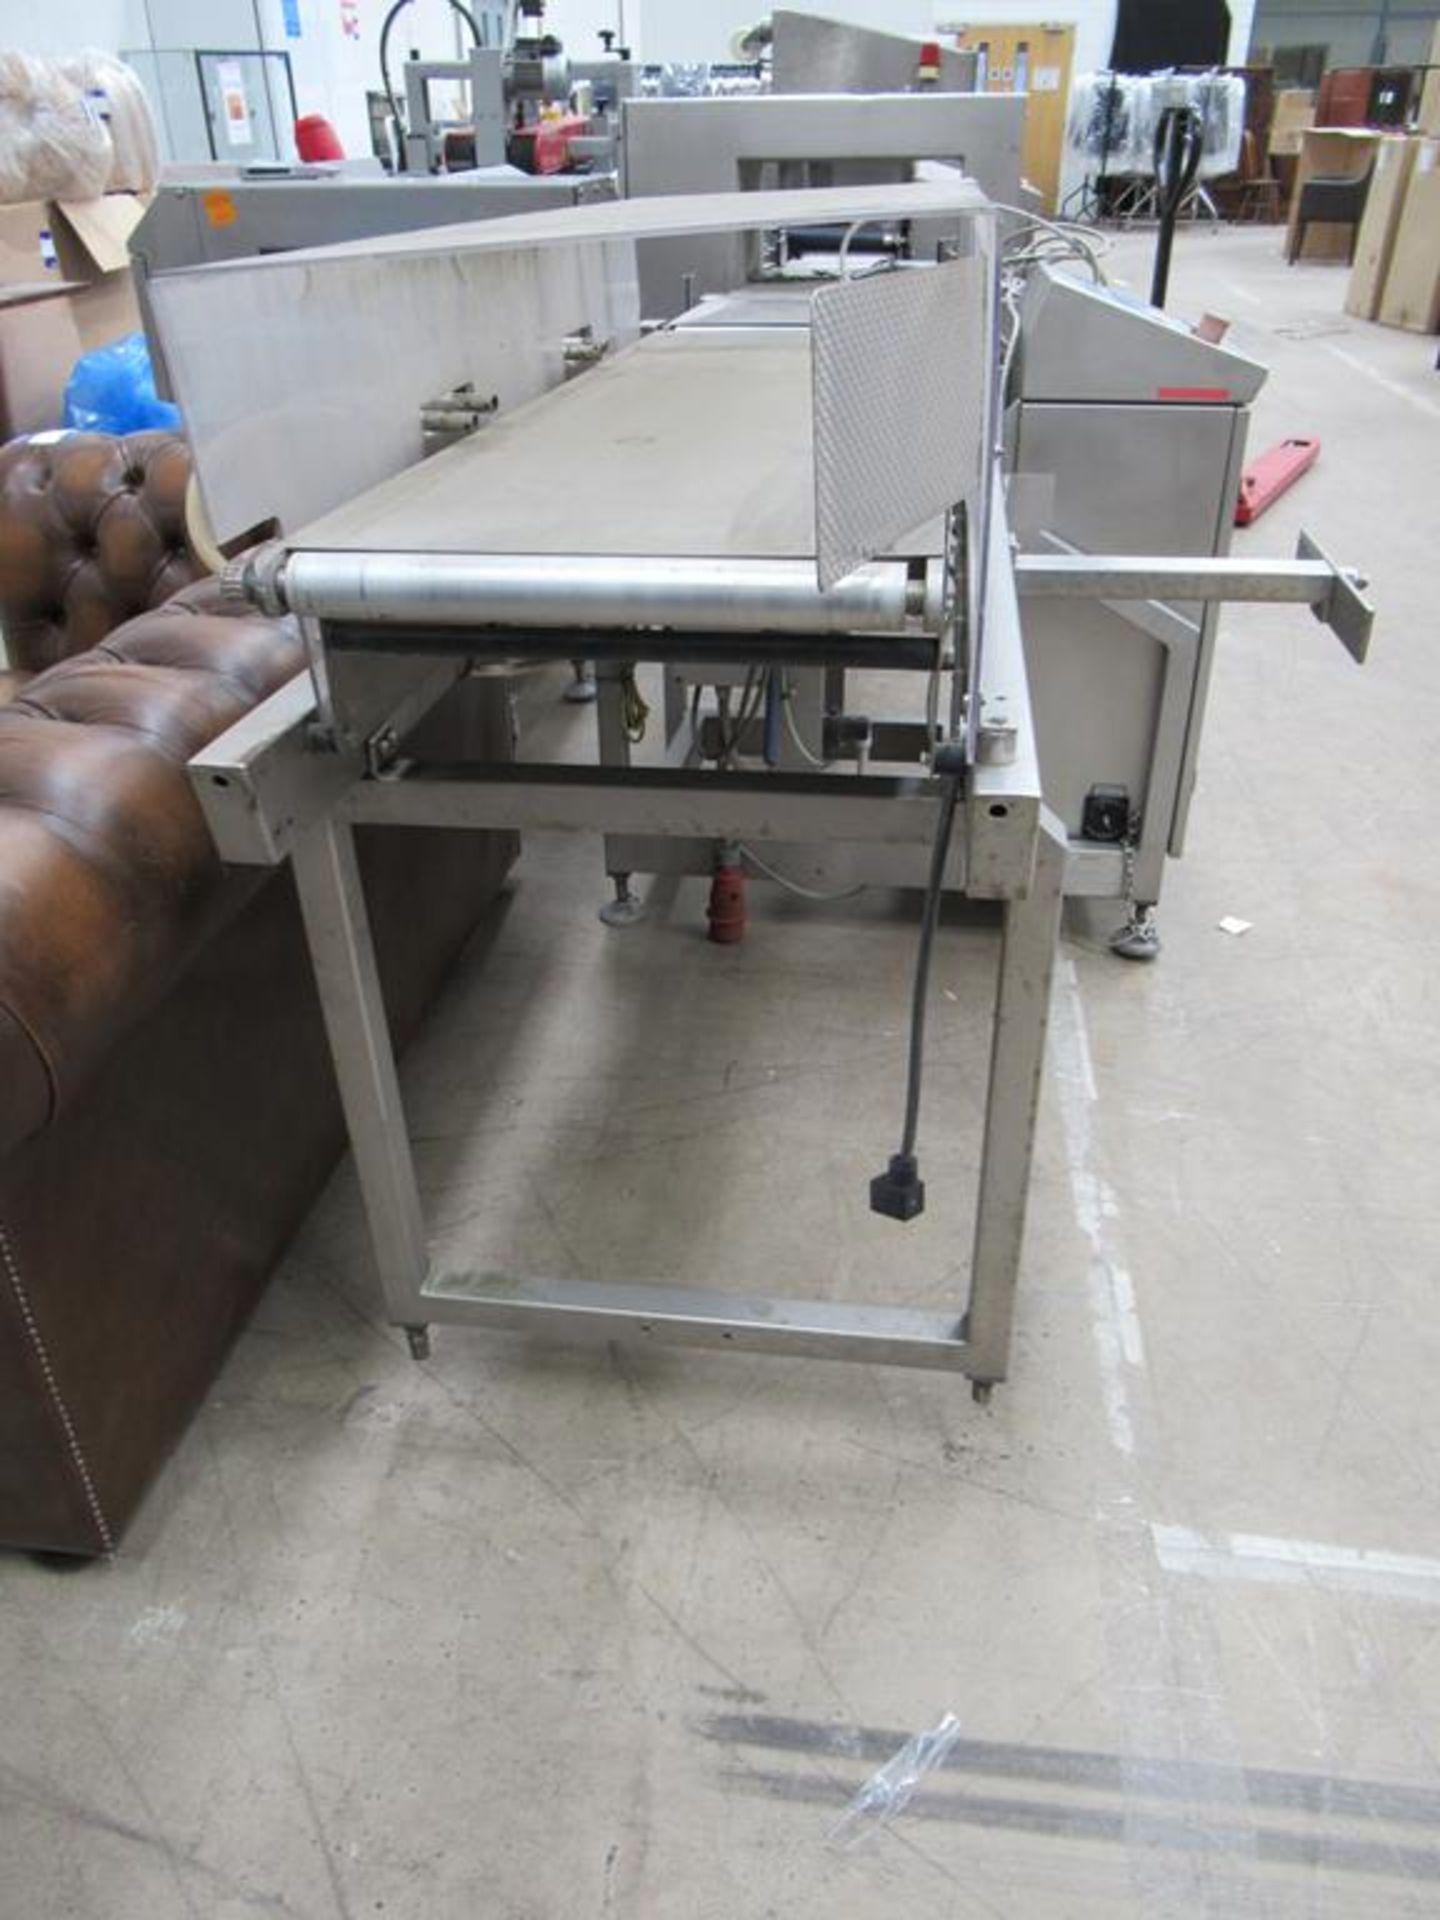 Loma 7000 Metal Detecting Conveyor - Image 6 of 7